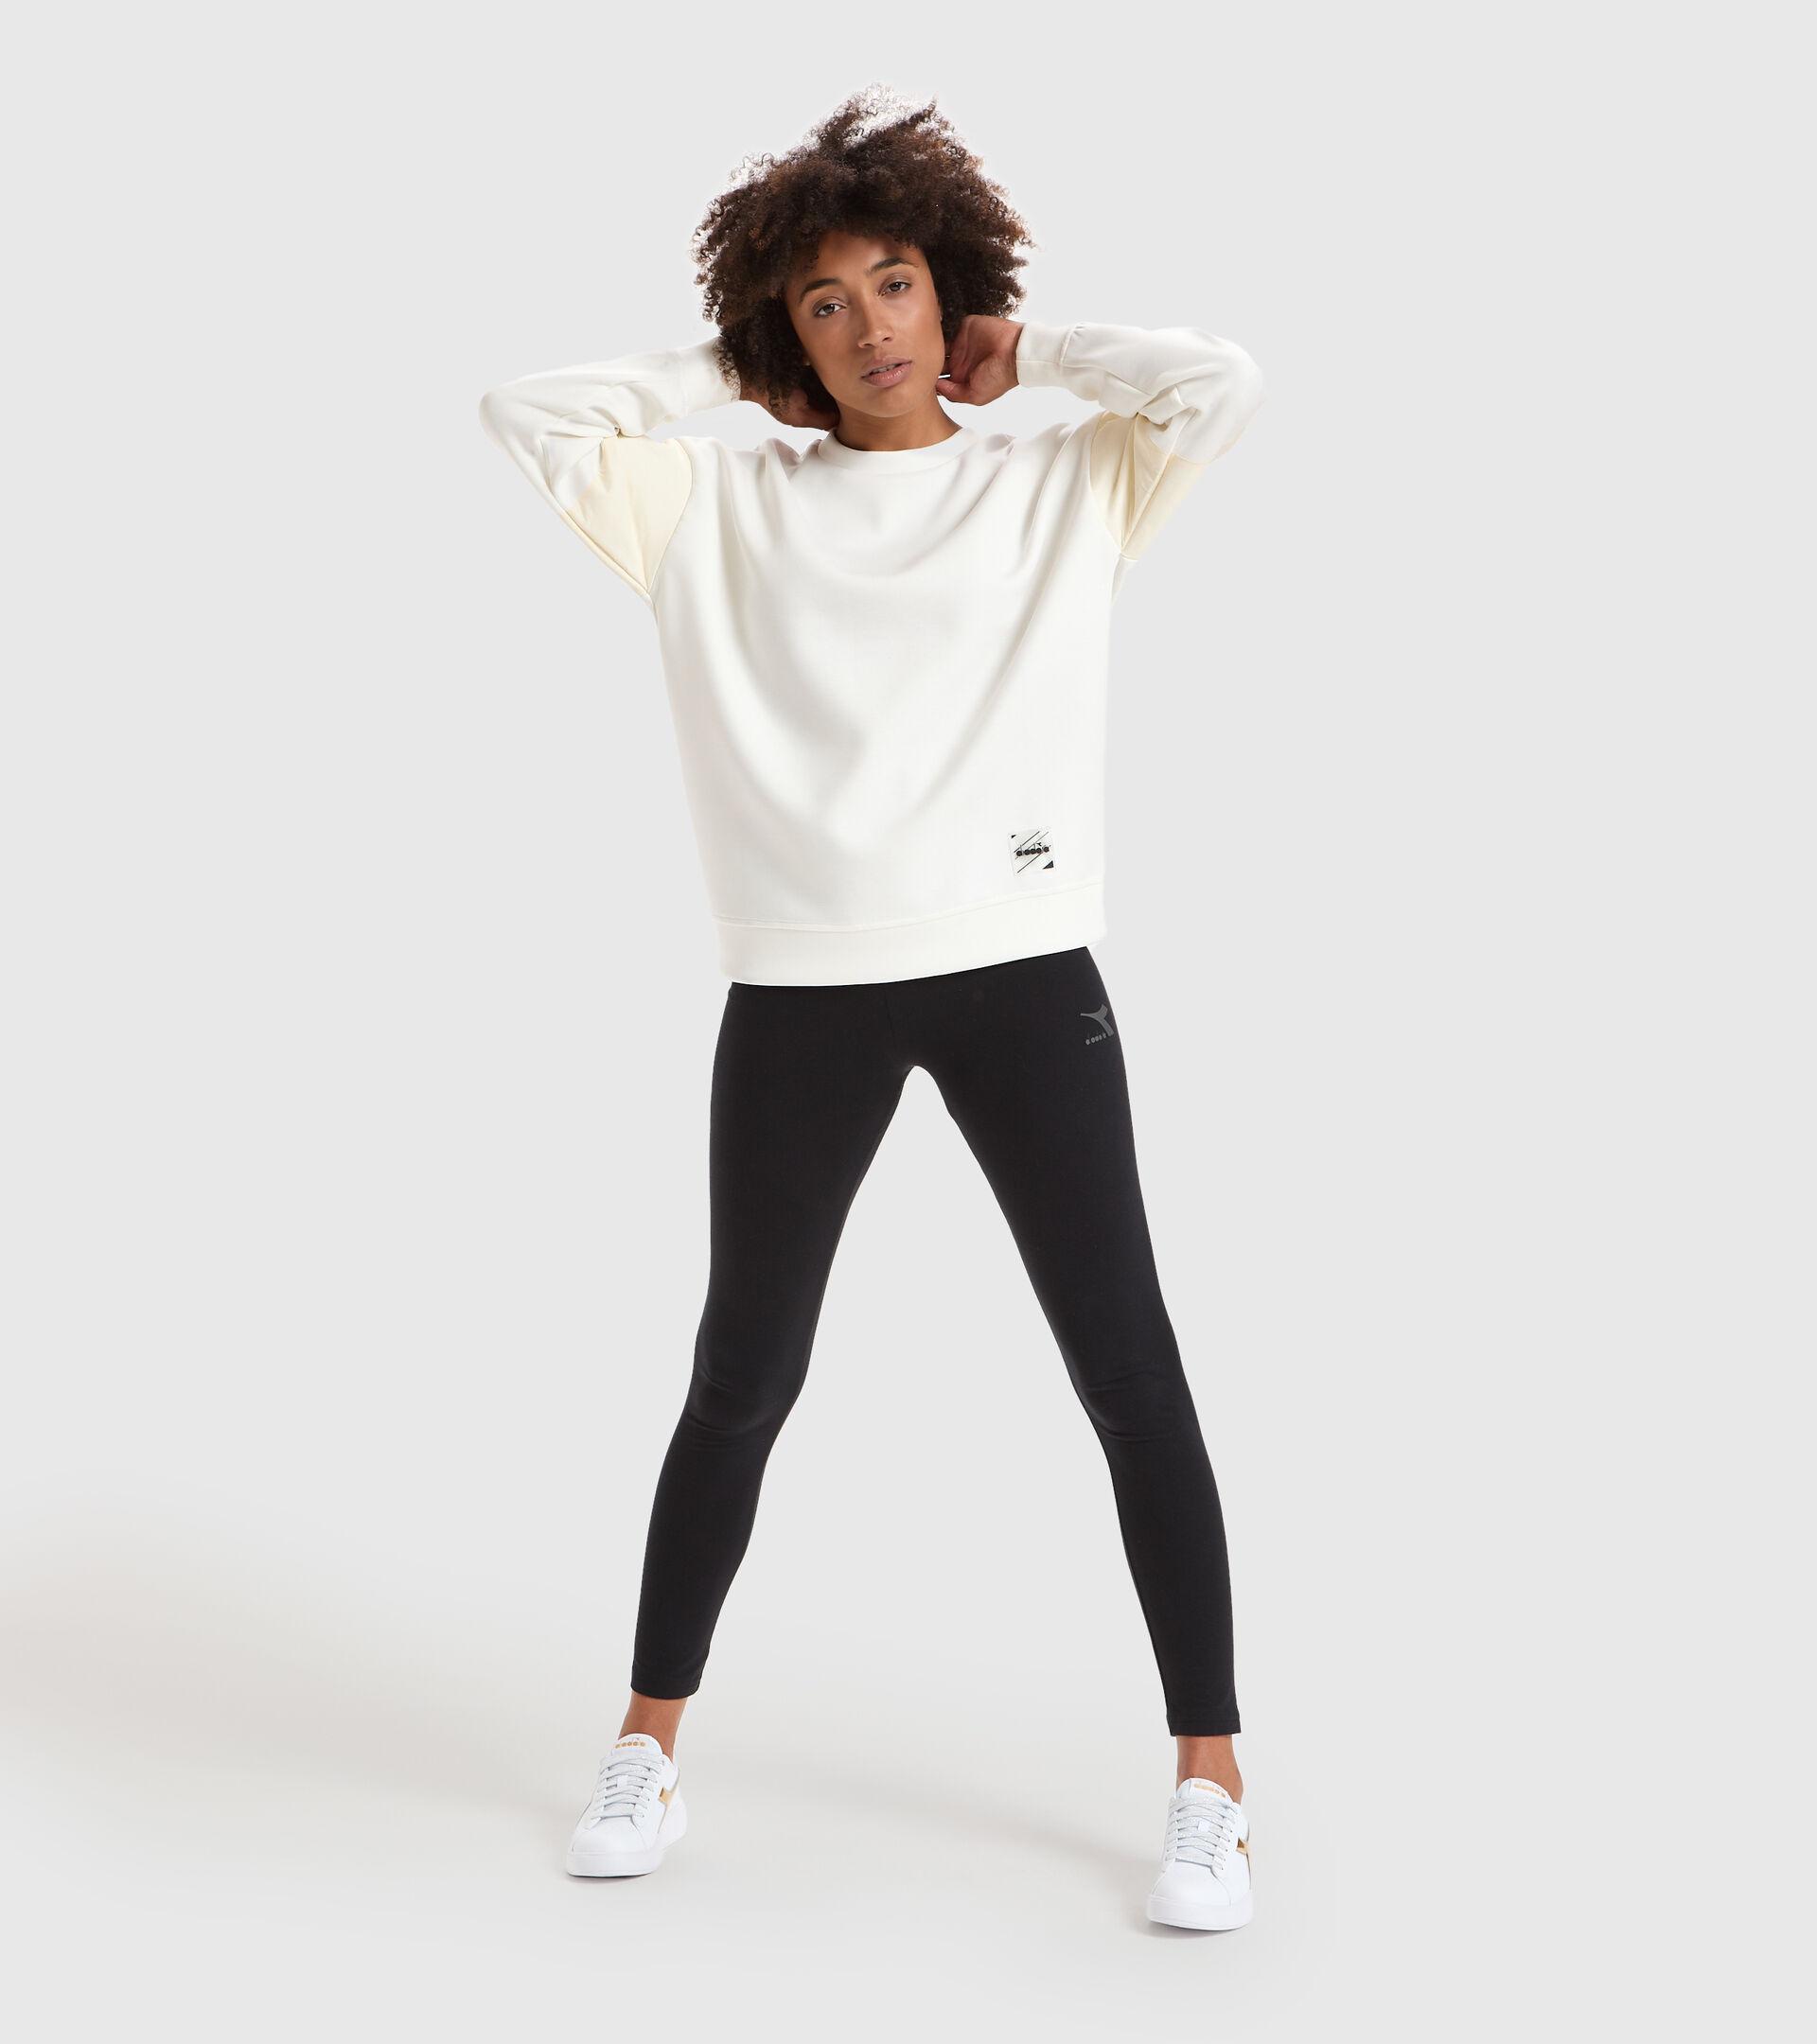 Apparel Sportswear DONNA L. SWEATSHIRT CREW URBANITY WHITE Diadora